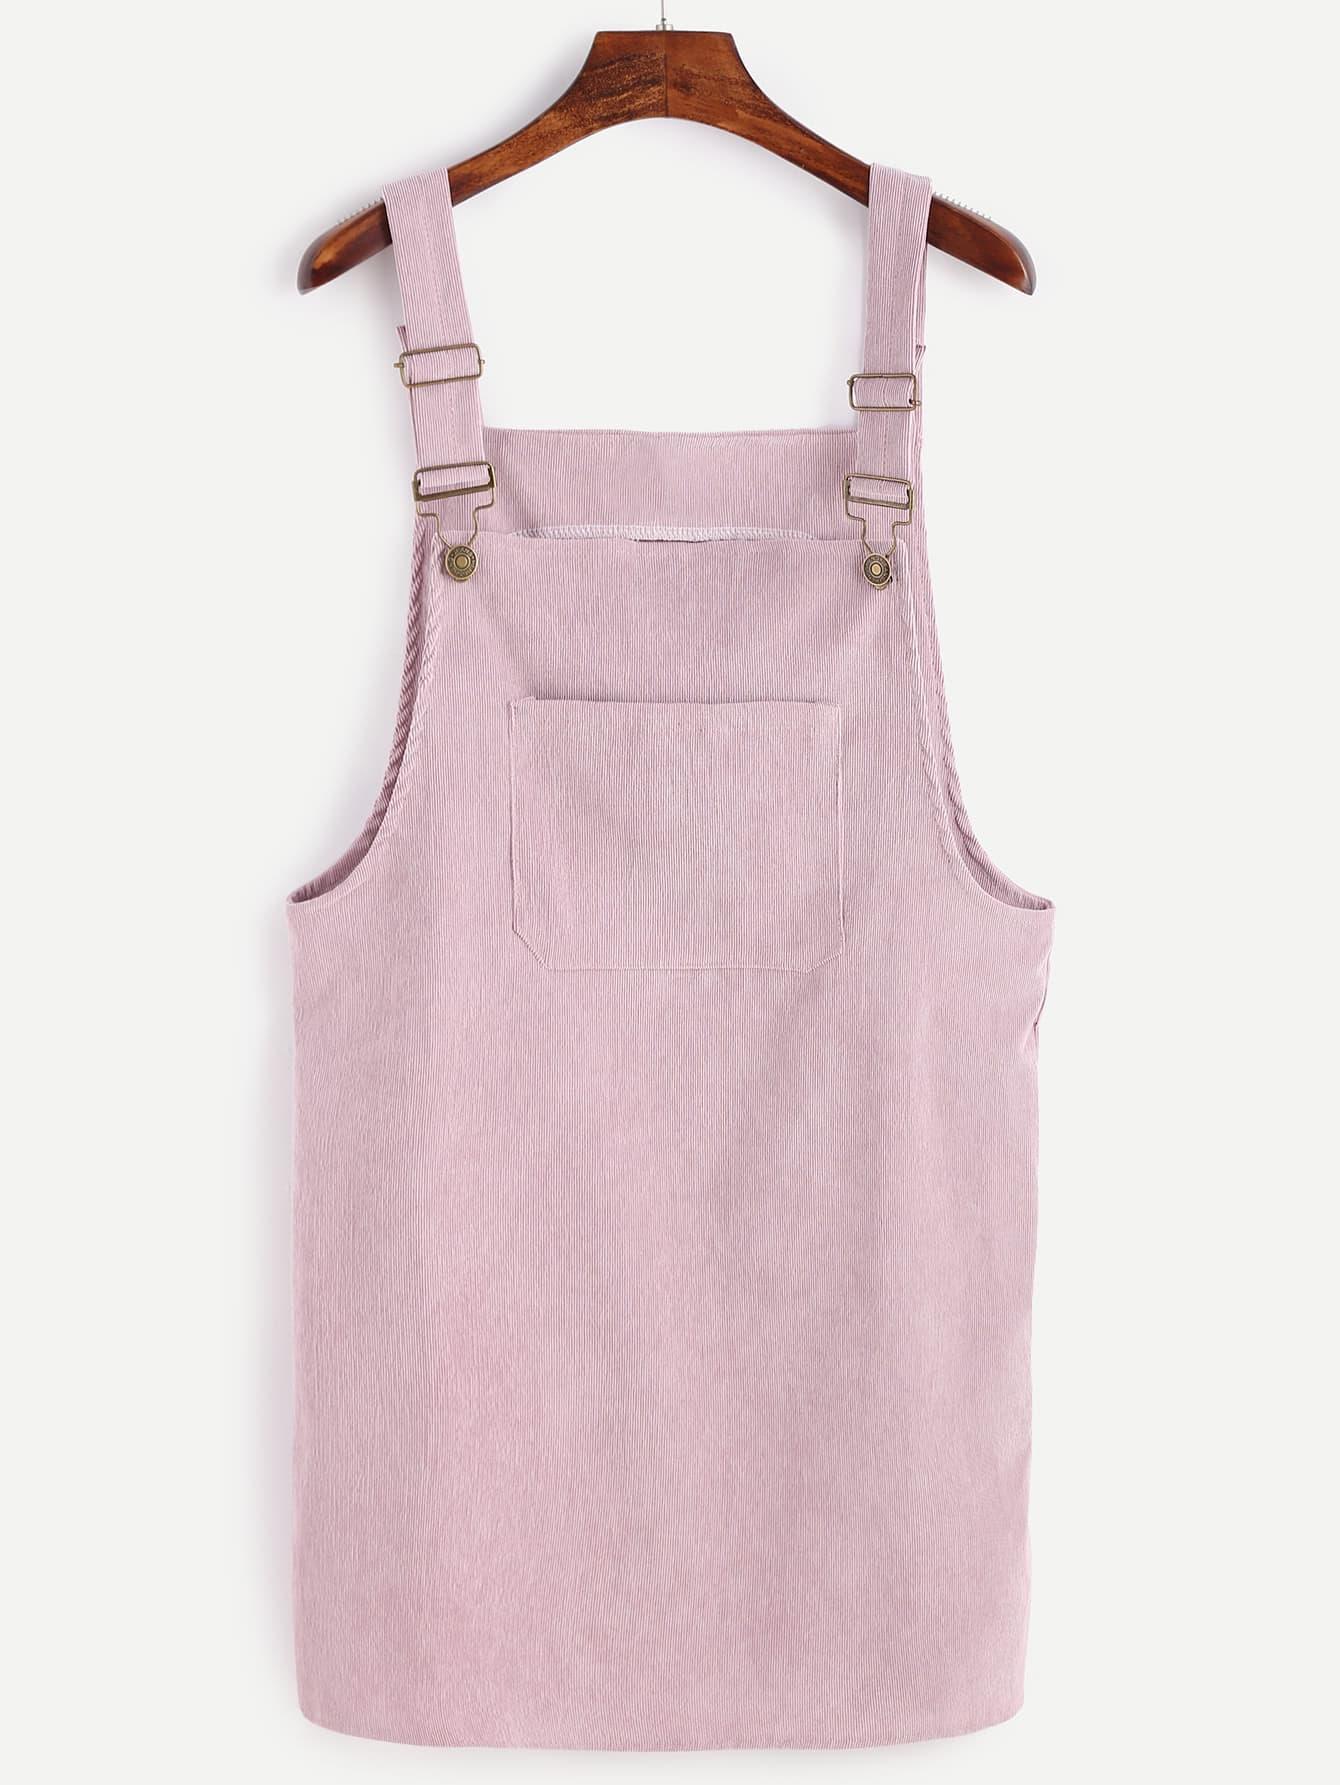 Corduroy Overall Dress With Pocket dress161021102